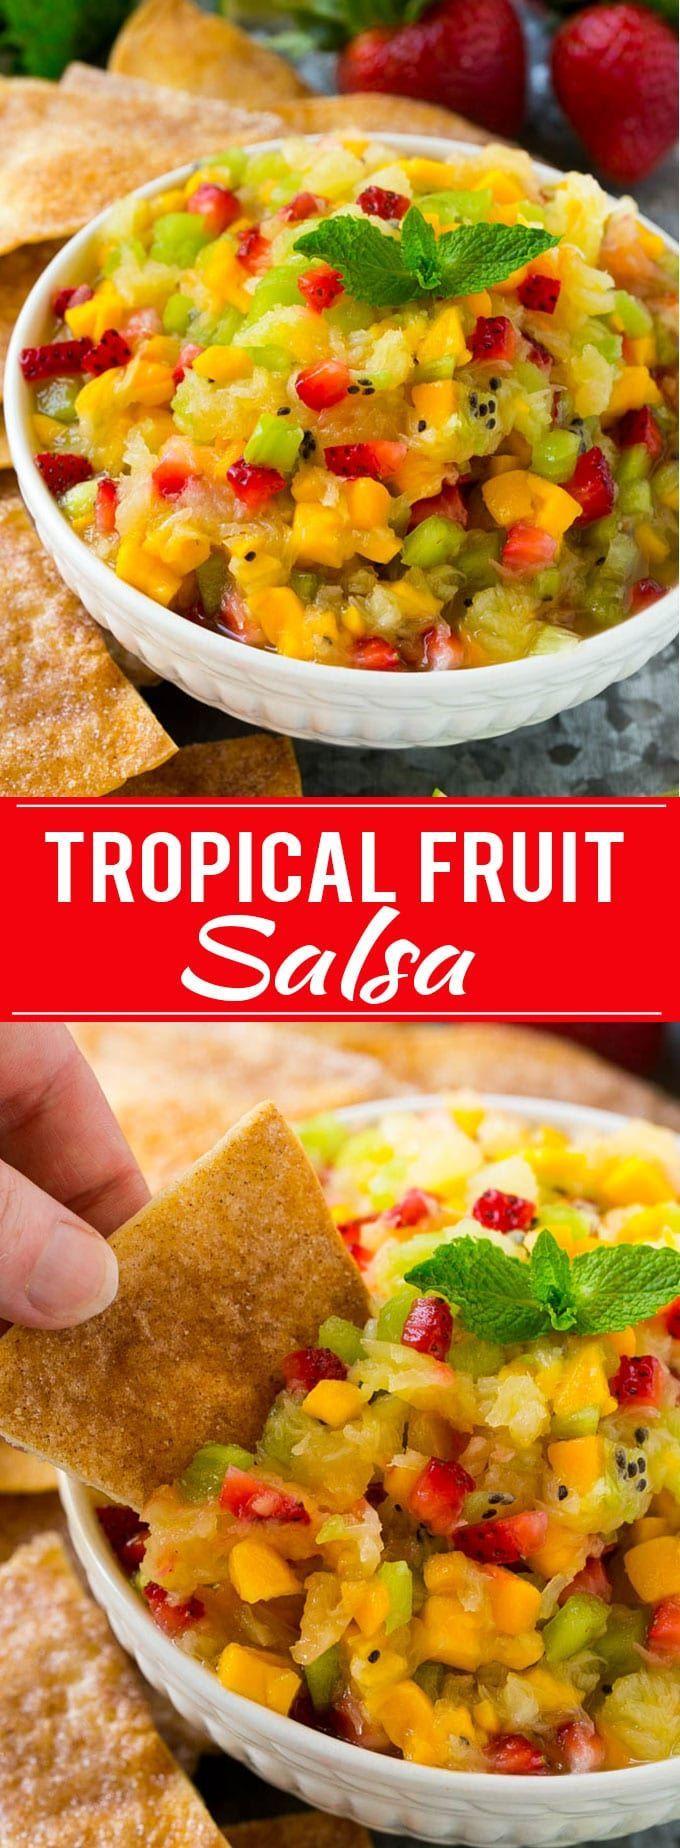 Fruit Salsa Recipe   Fruit Salsa with Cinnamon Chips   Tropical Fruit Salsa Recipe   Easy Appetizer Recipe   Easy Dessert Recipe